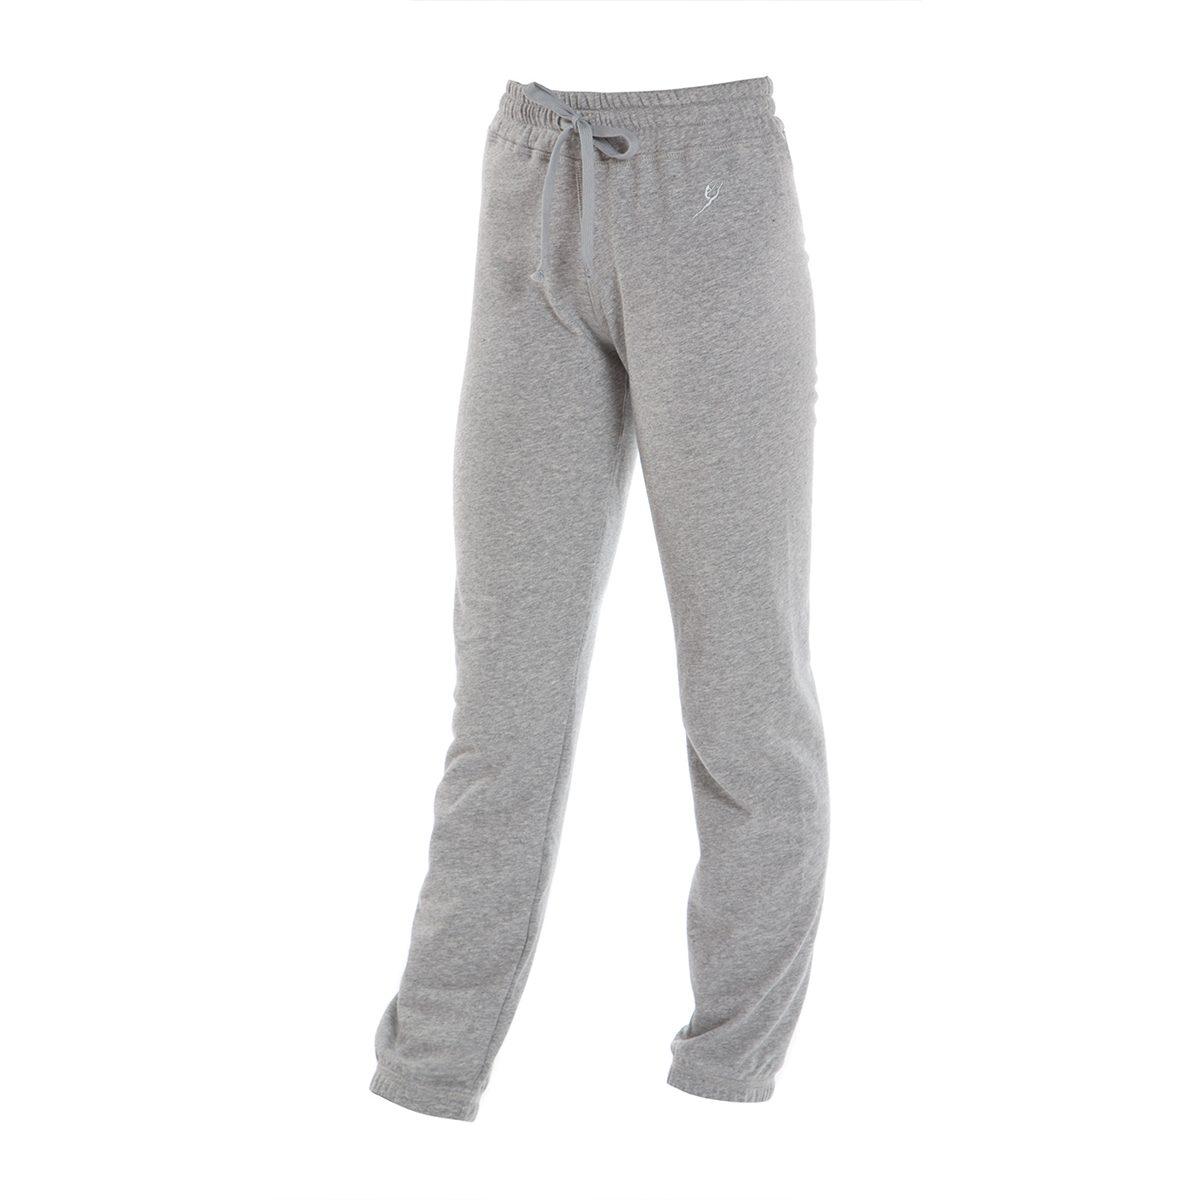 8f484680581e Energetiks Alex Track Pant - Boys - Dance Desire Dance Store